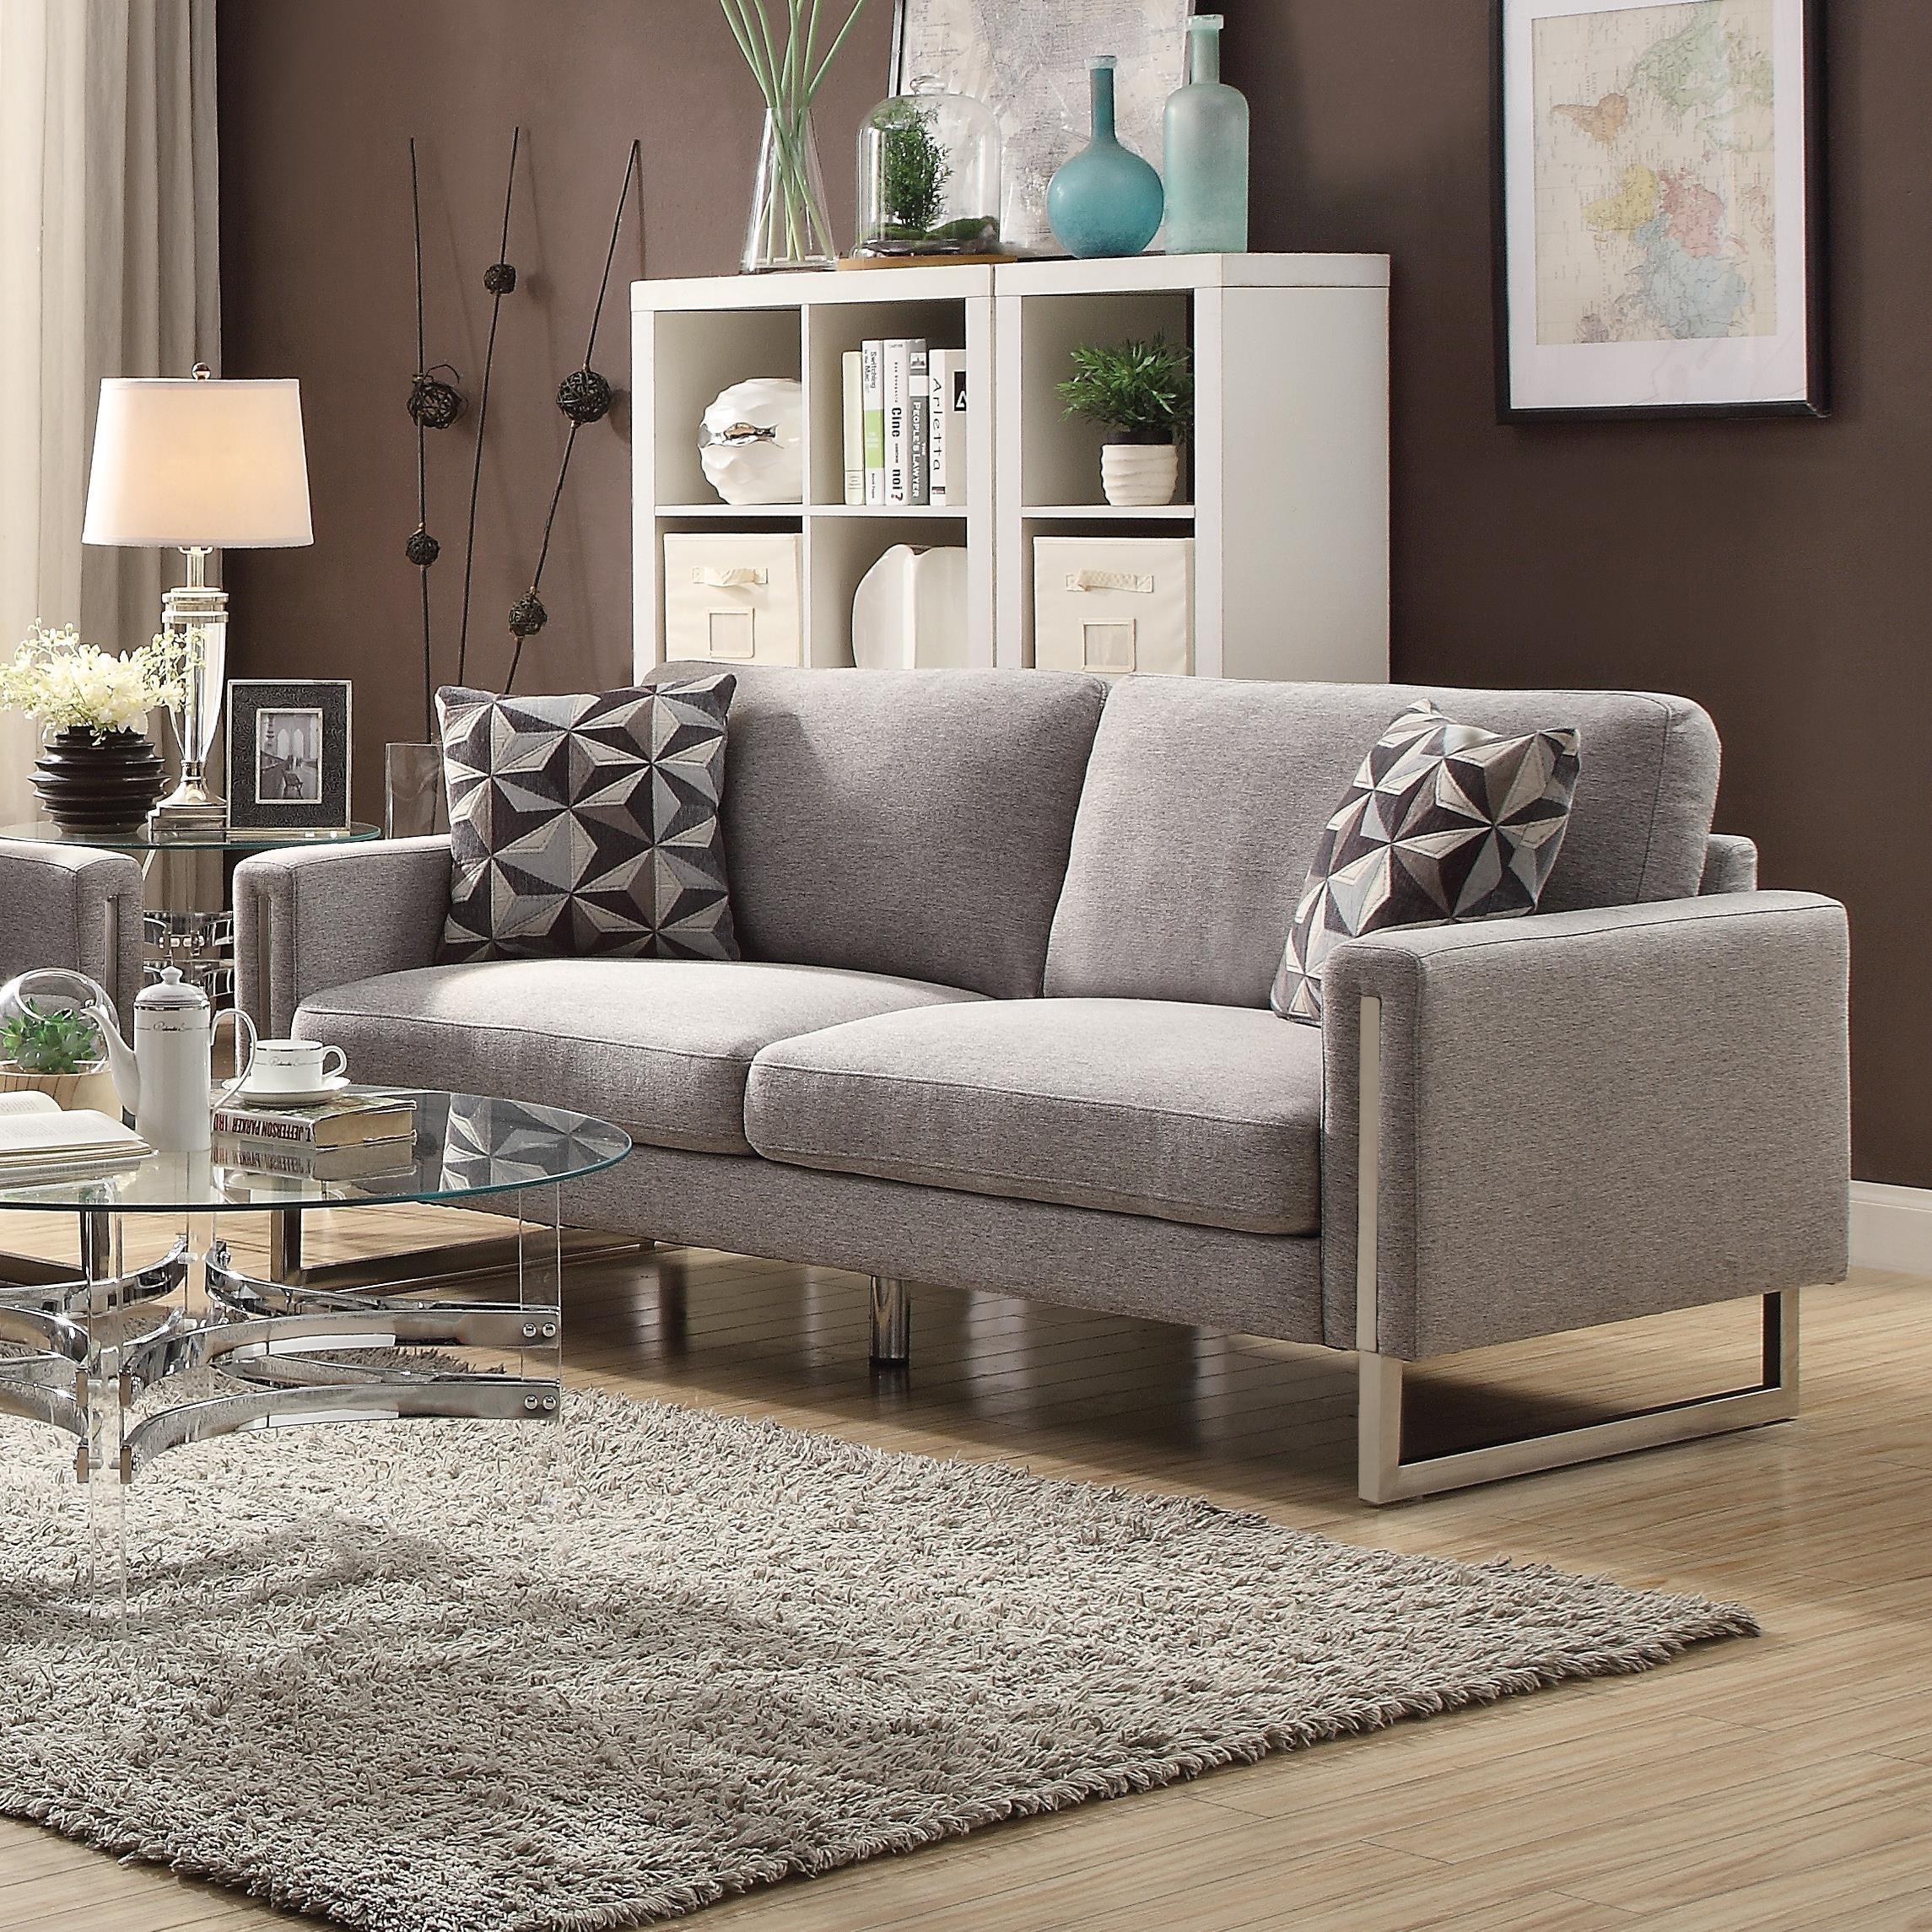 Coaster Stellan 551241 Modern Sofa With U Shaped Steel Legs | Becku0027s  Furniture | Sofas